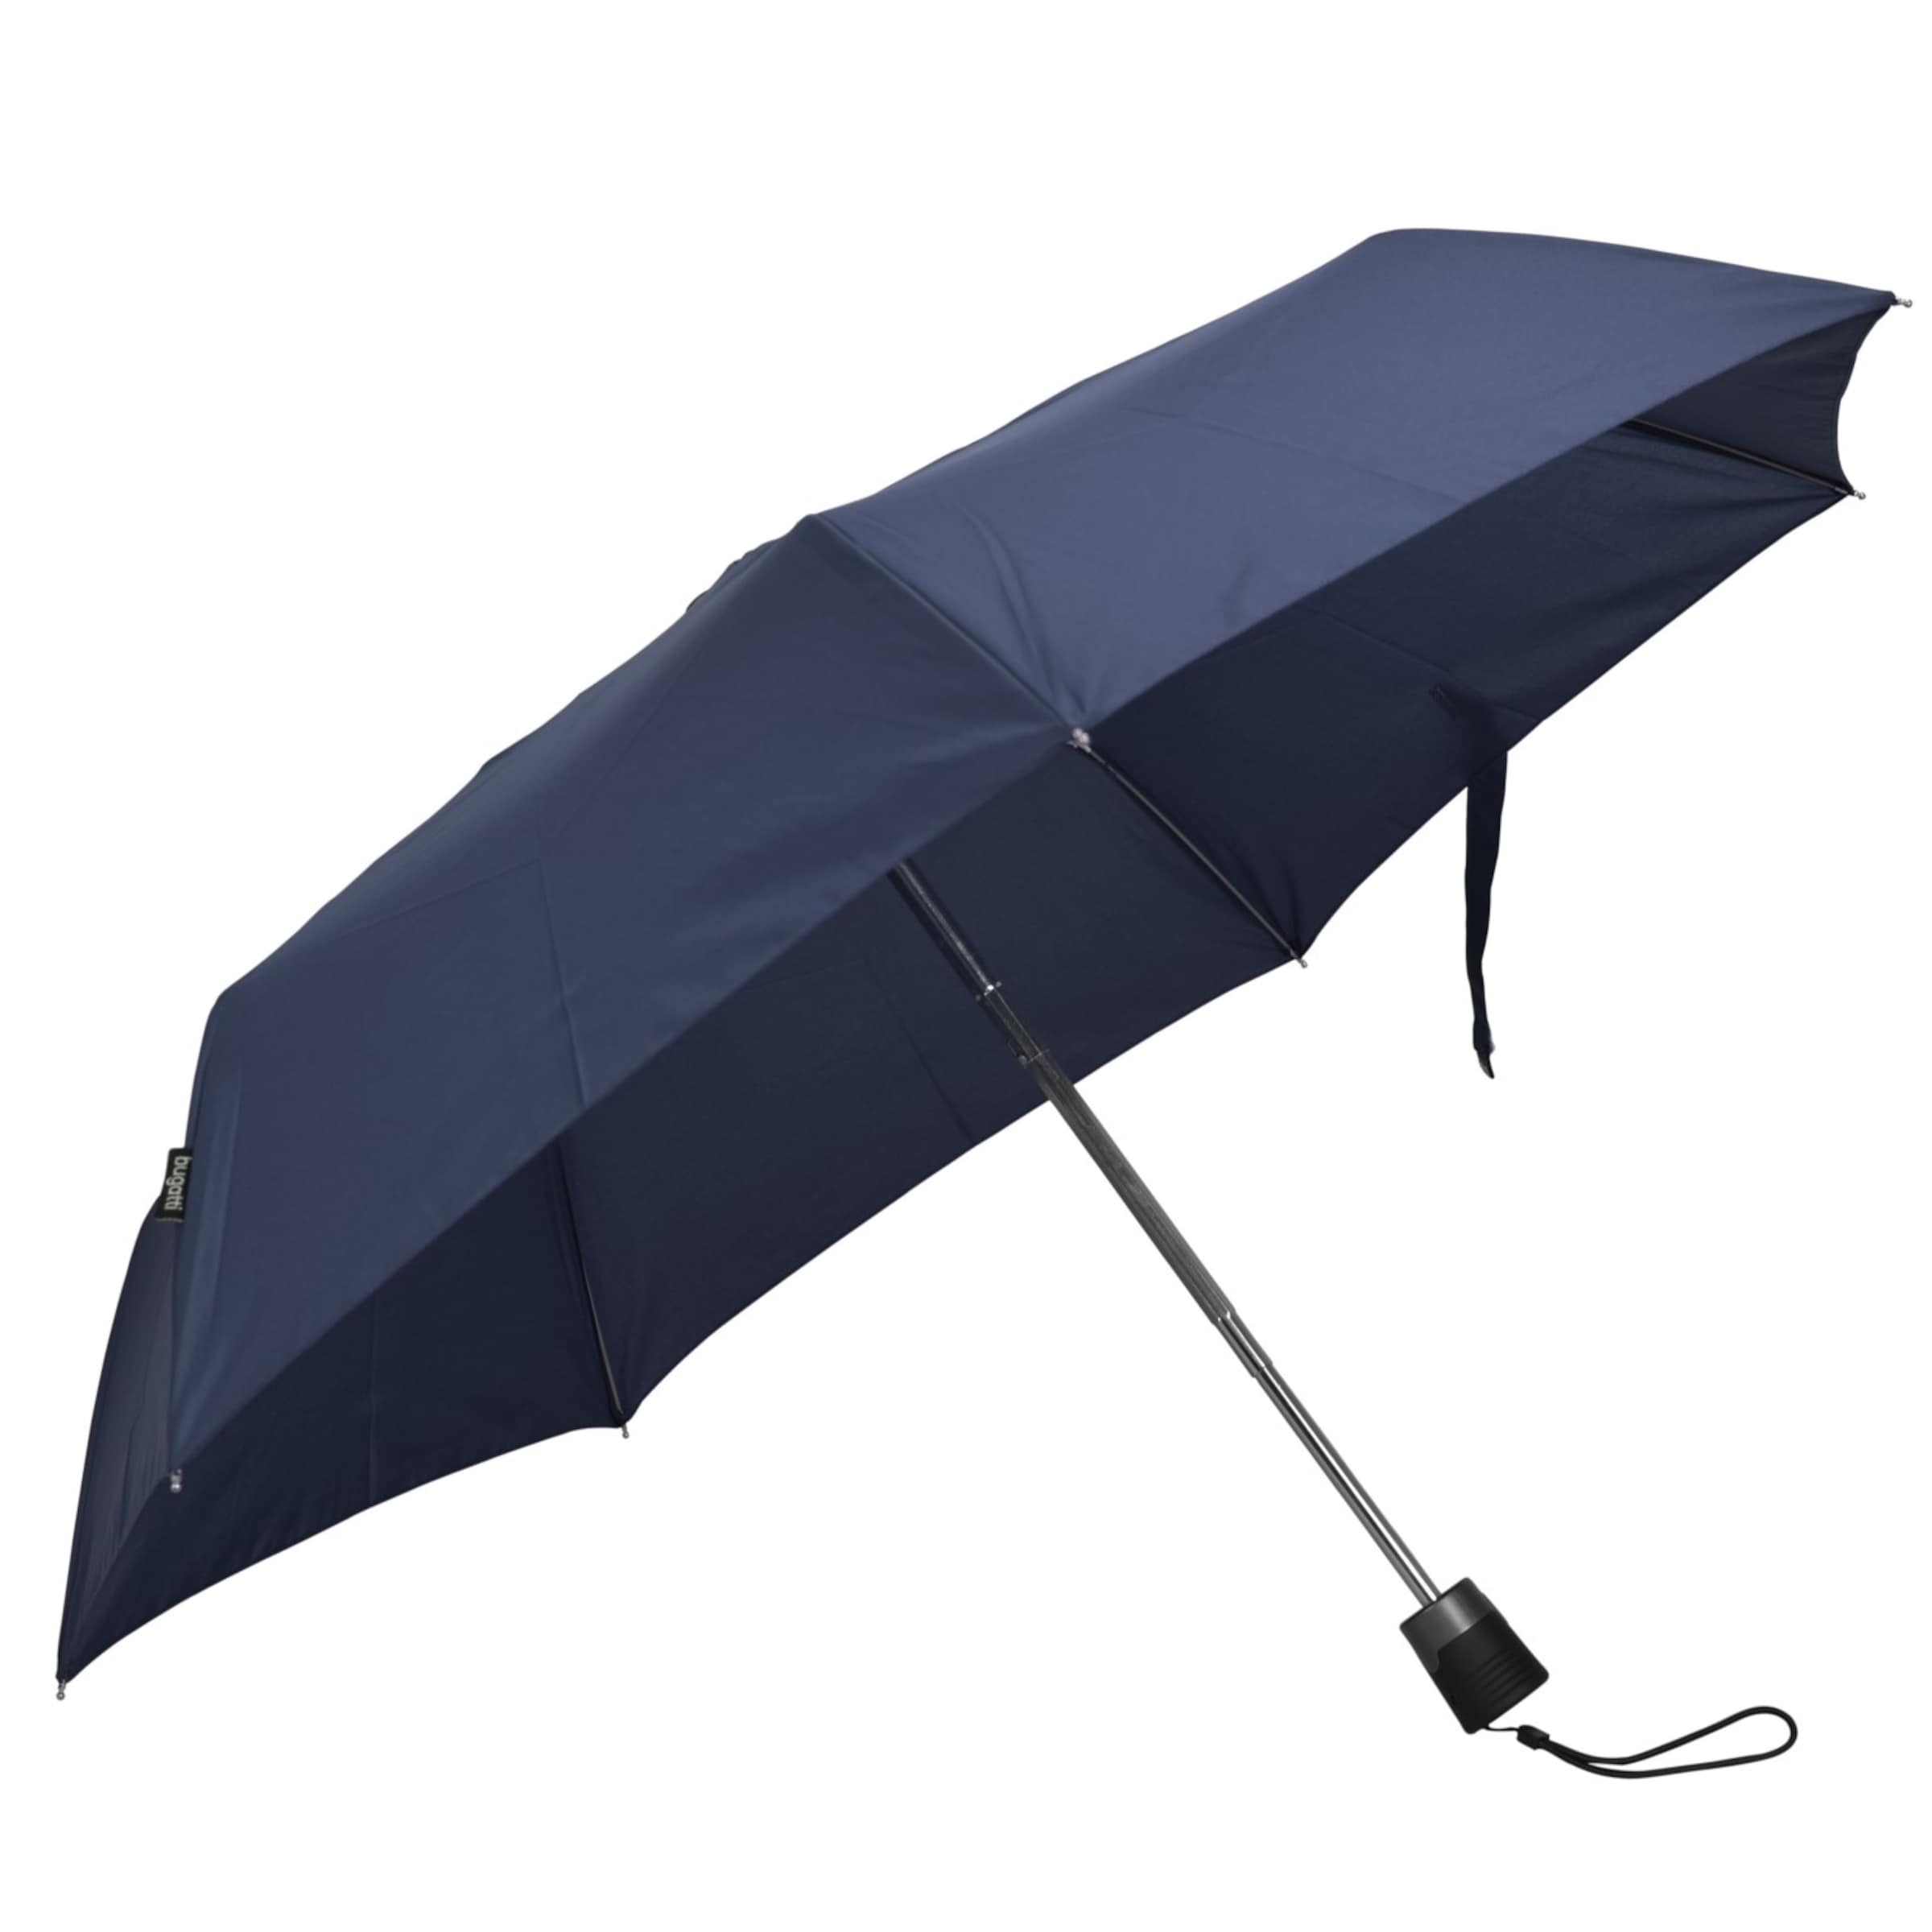 Bleu Marine Parapluie Bugatti Parapluie Bugatti En En En Parapluie Bugatti Marine Bleu PXnO80kw